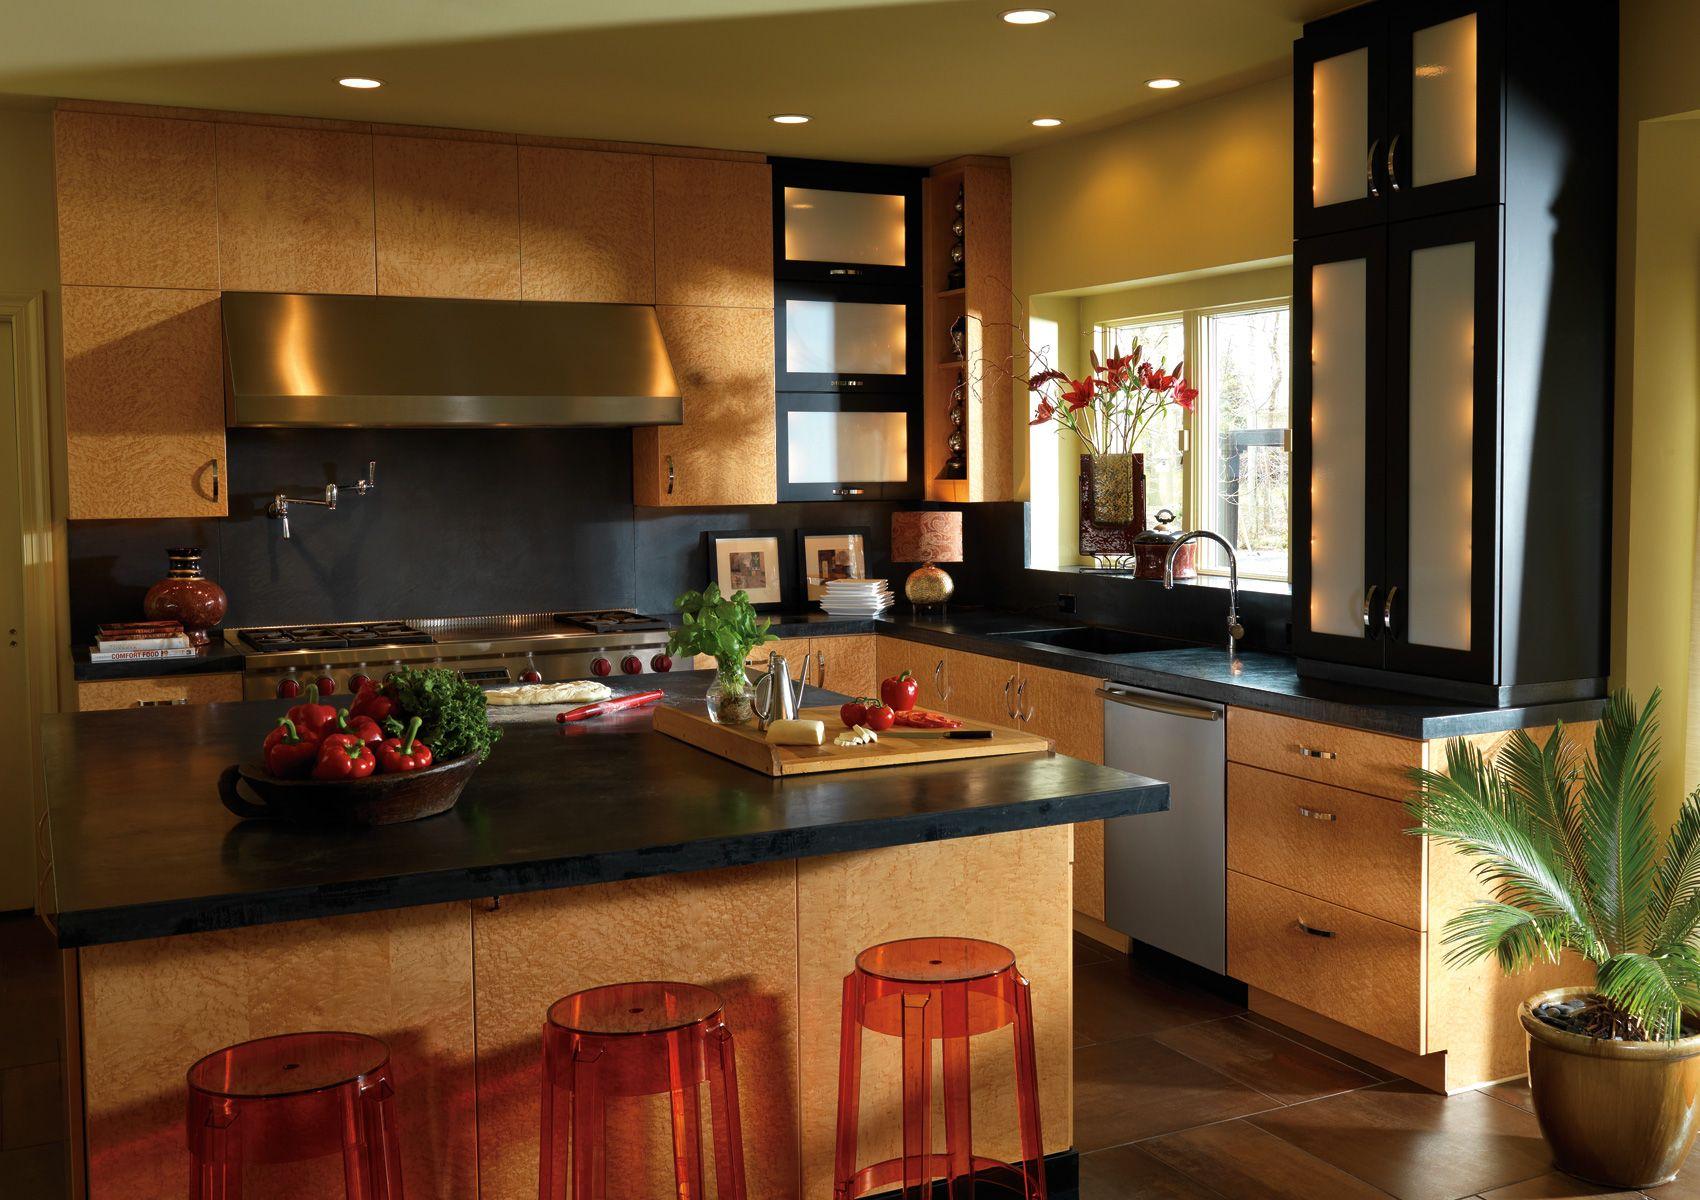 Hot Kitchen Design Trends For 2017 Http Www Wersdecor Website 05 03